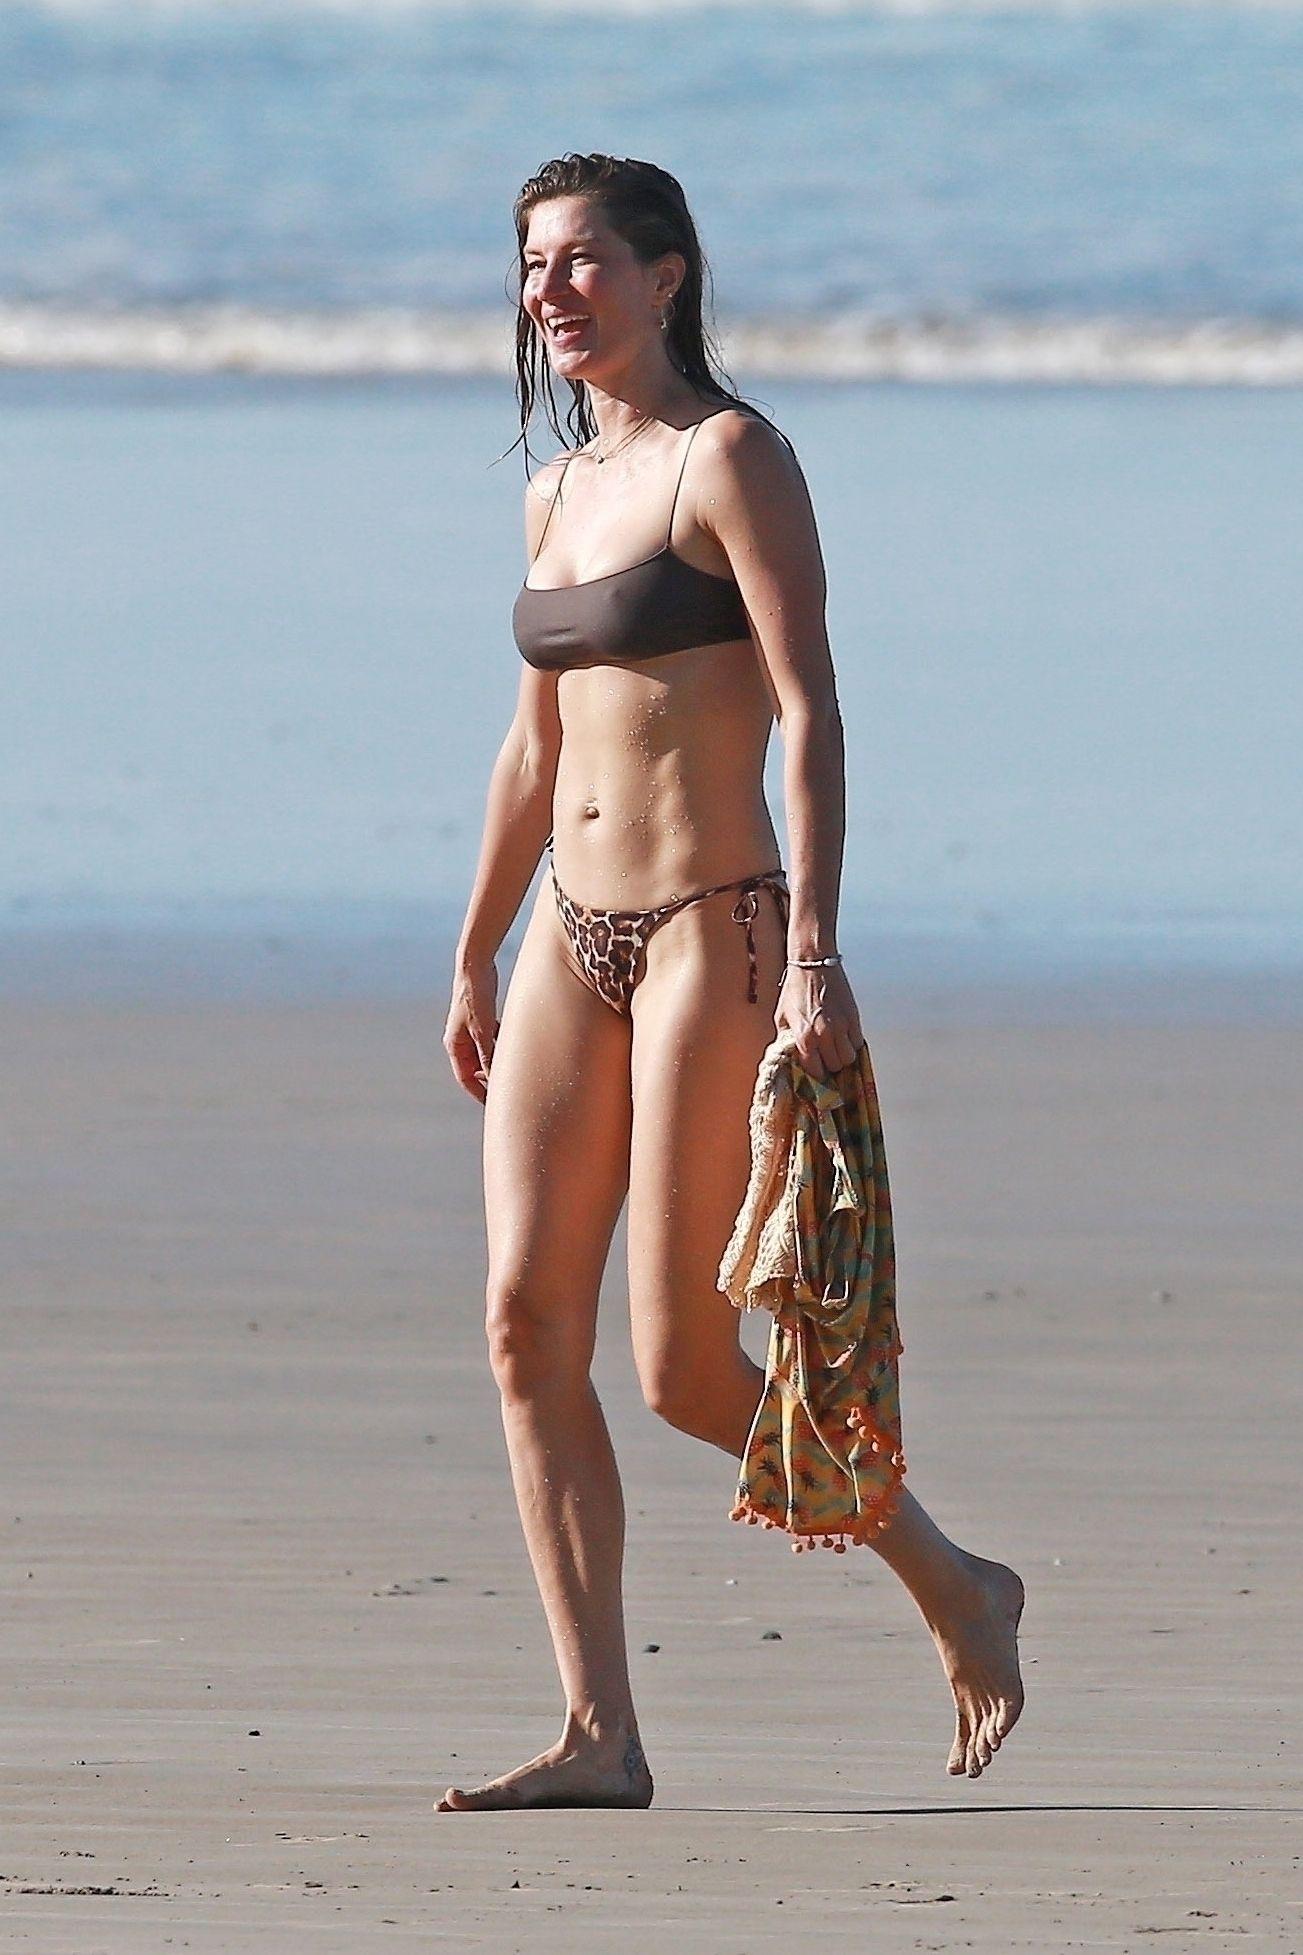 Gisele Bundchen Puts Her Incredible Bikini Body On Display During A Beach Photoshoot 0010